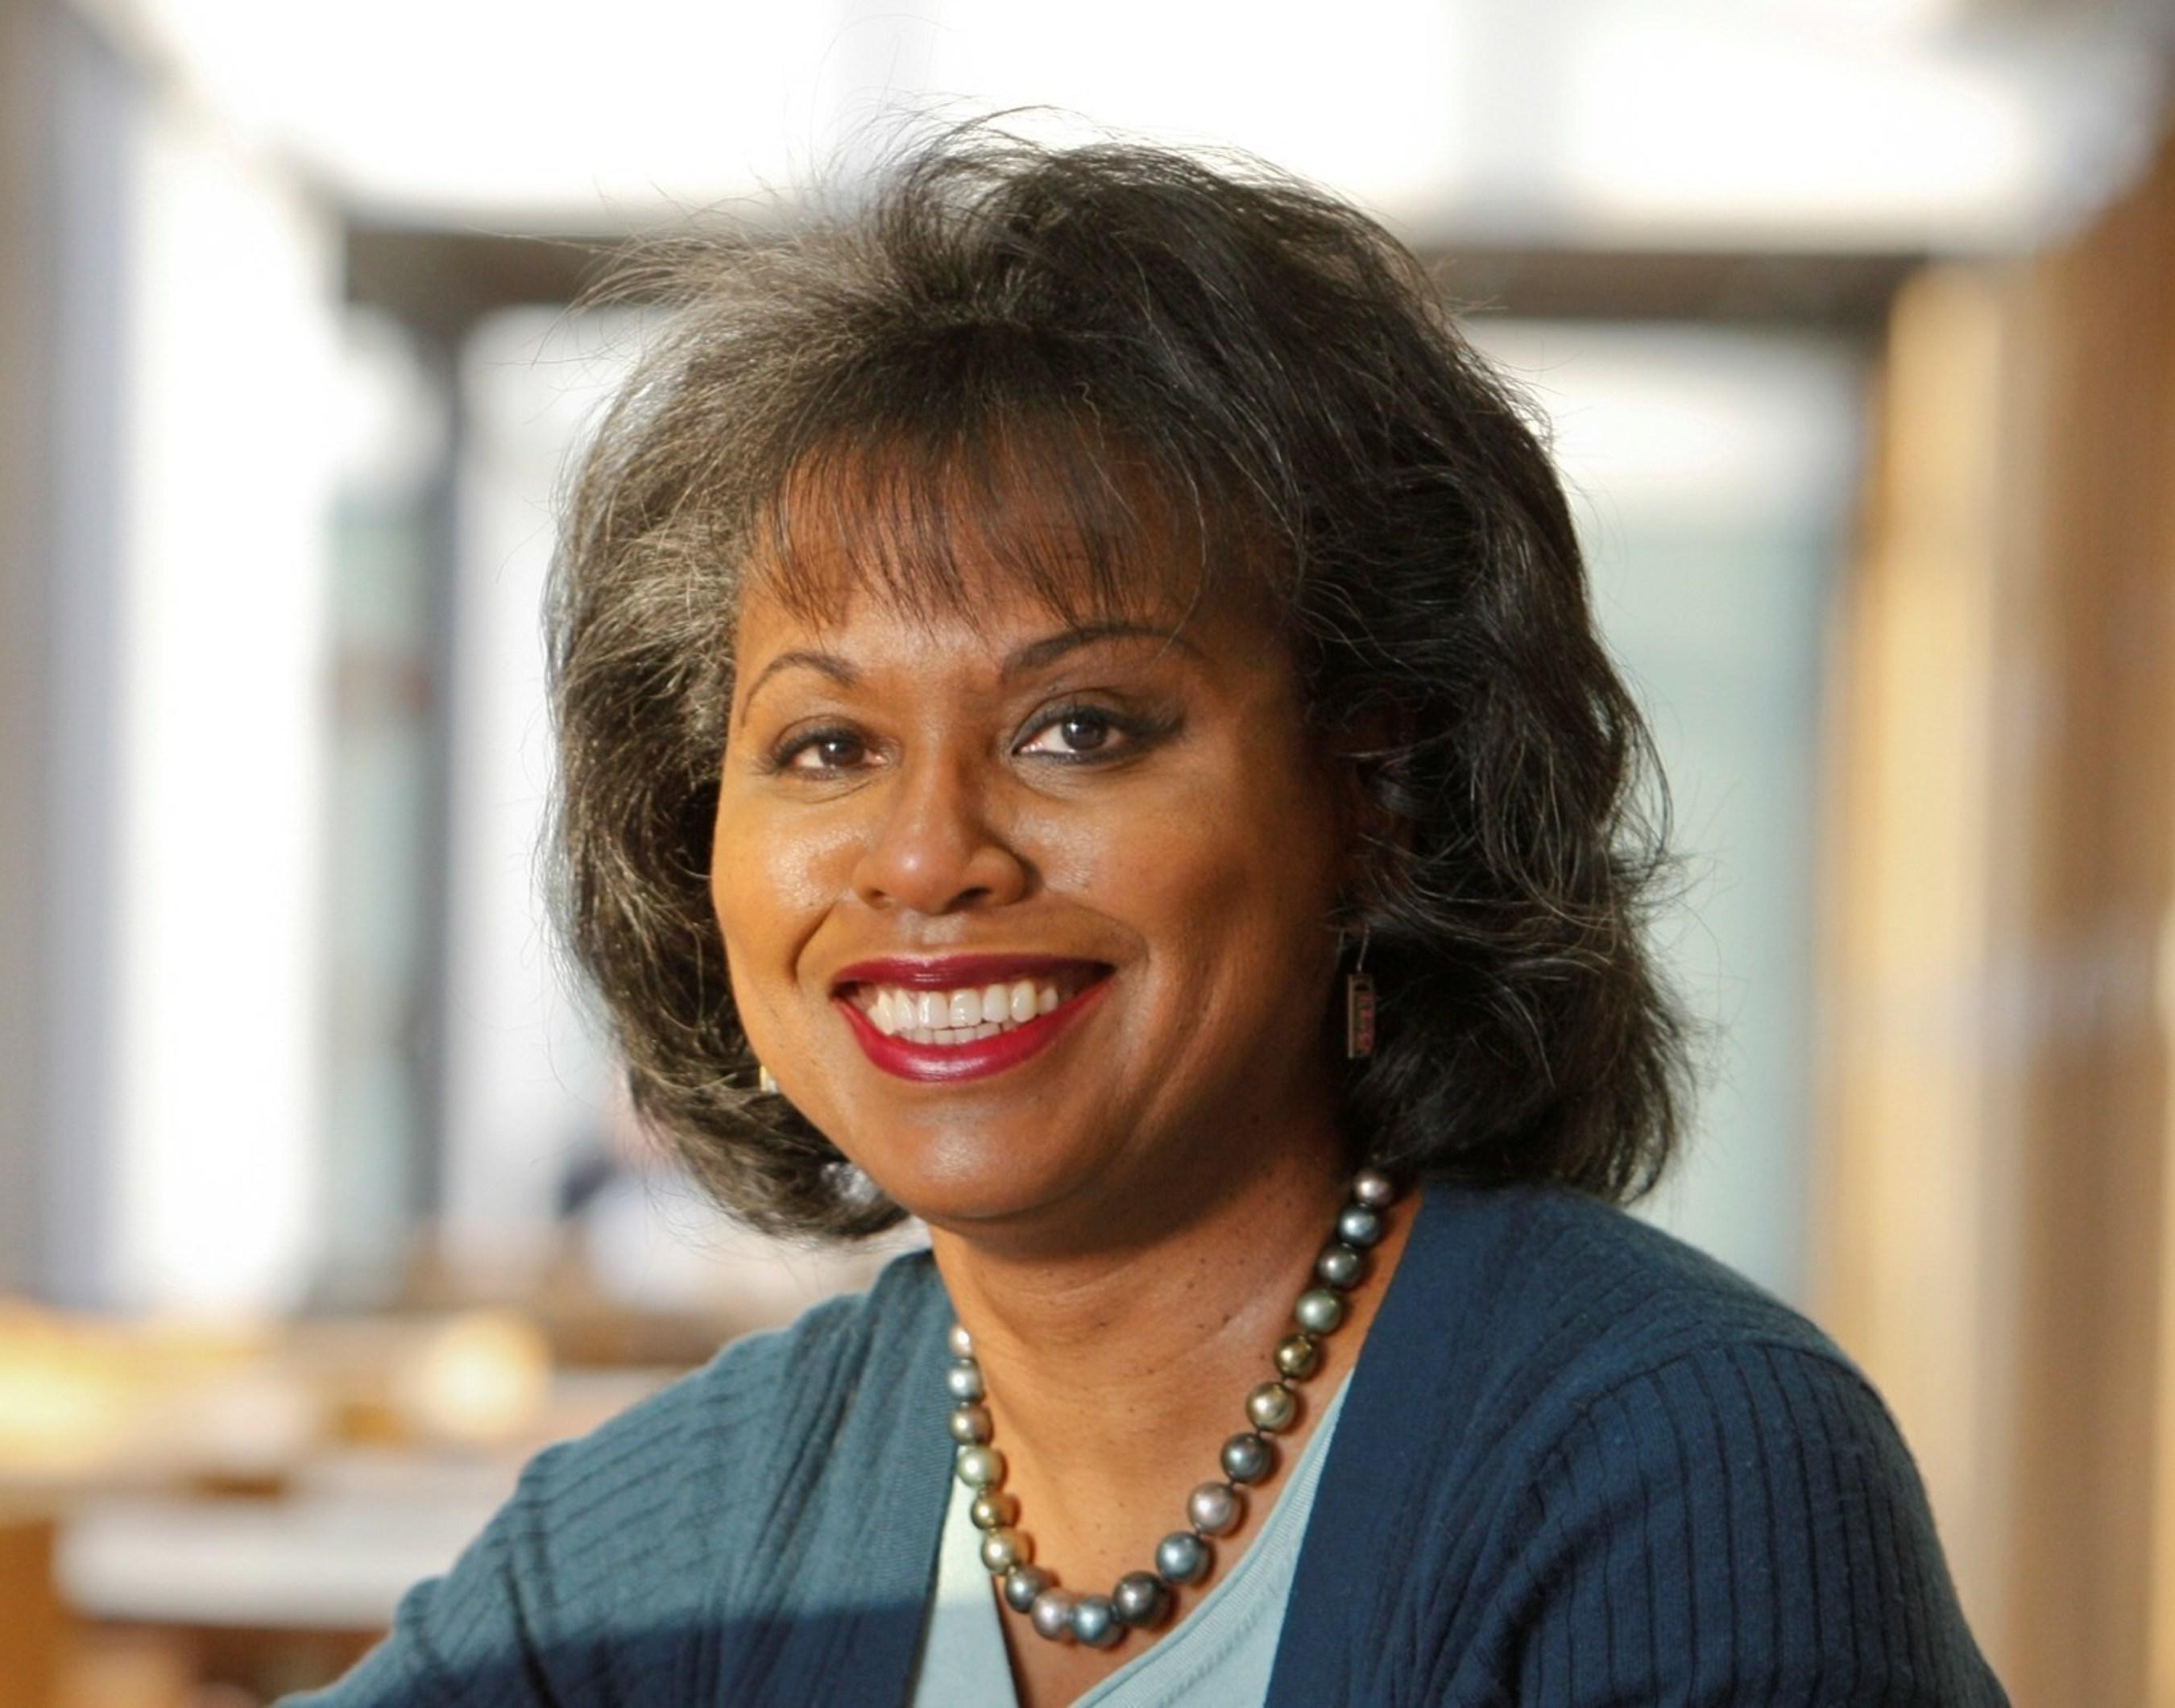 Civil Rights Advocate Anita Hill to headline Pennsylvania Conference for Women